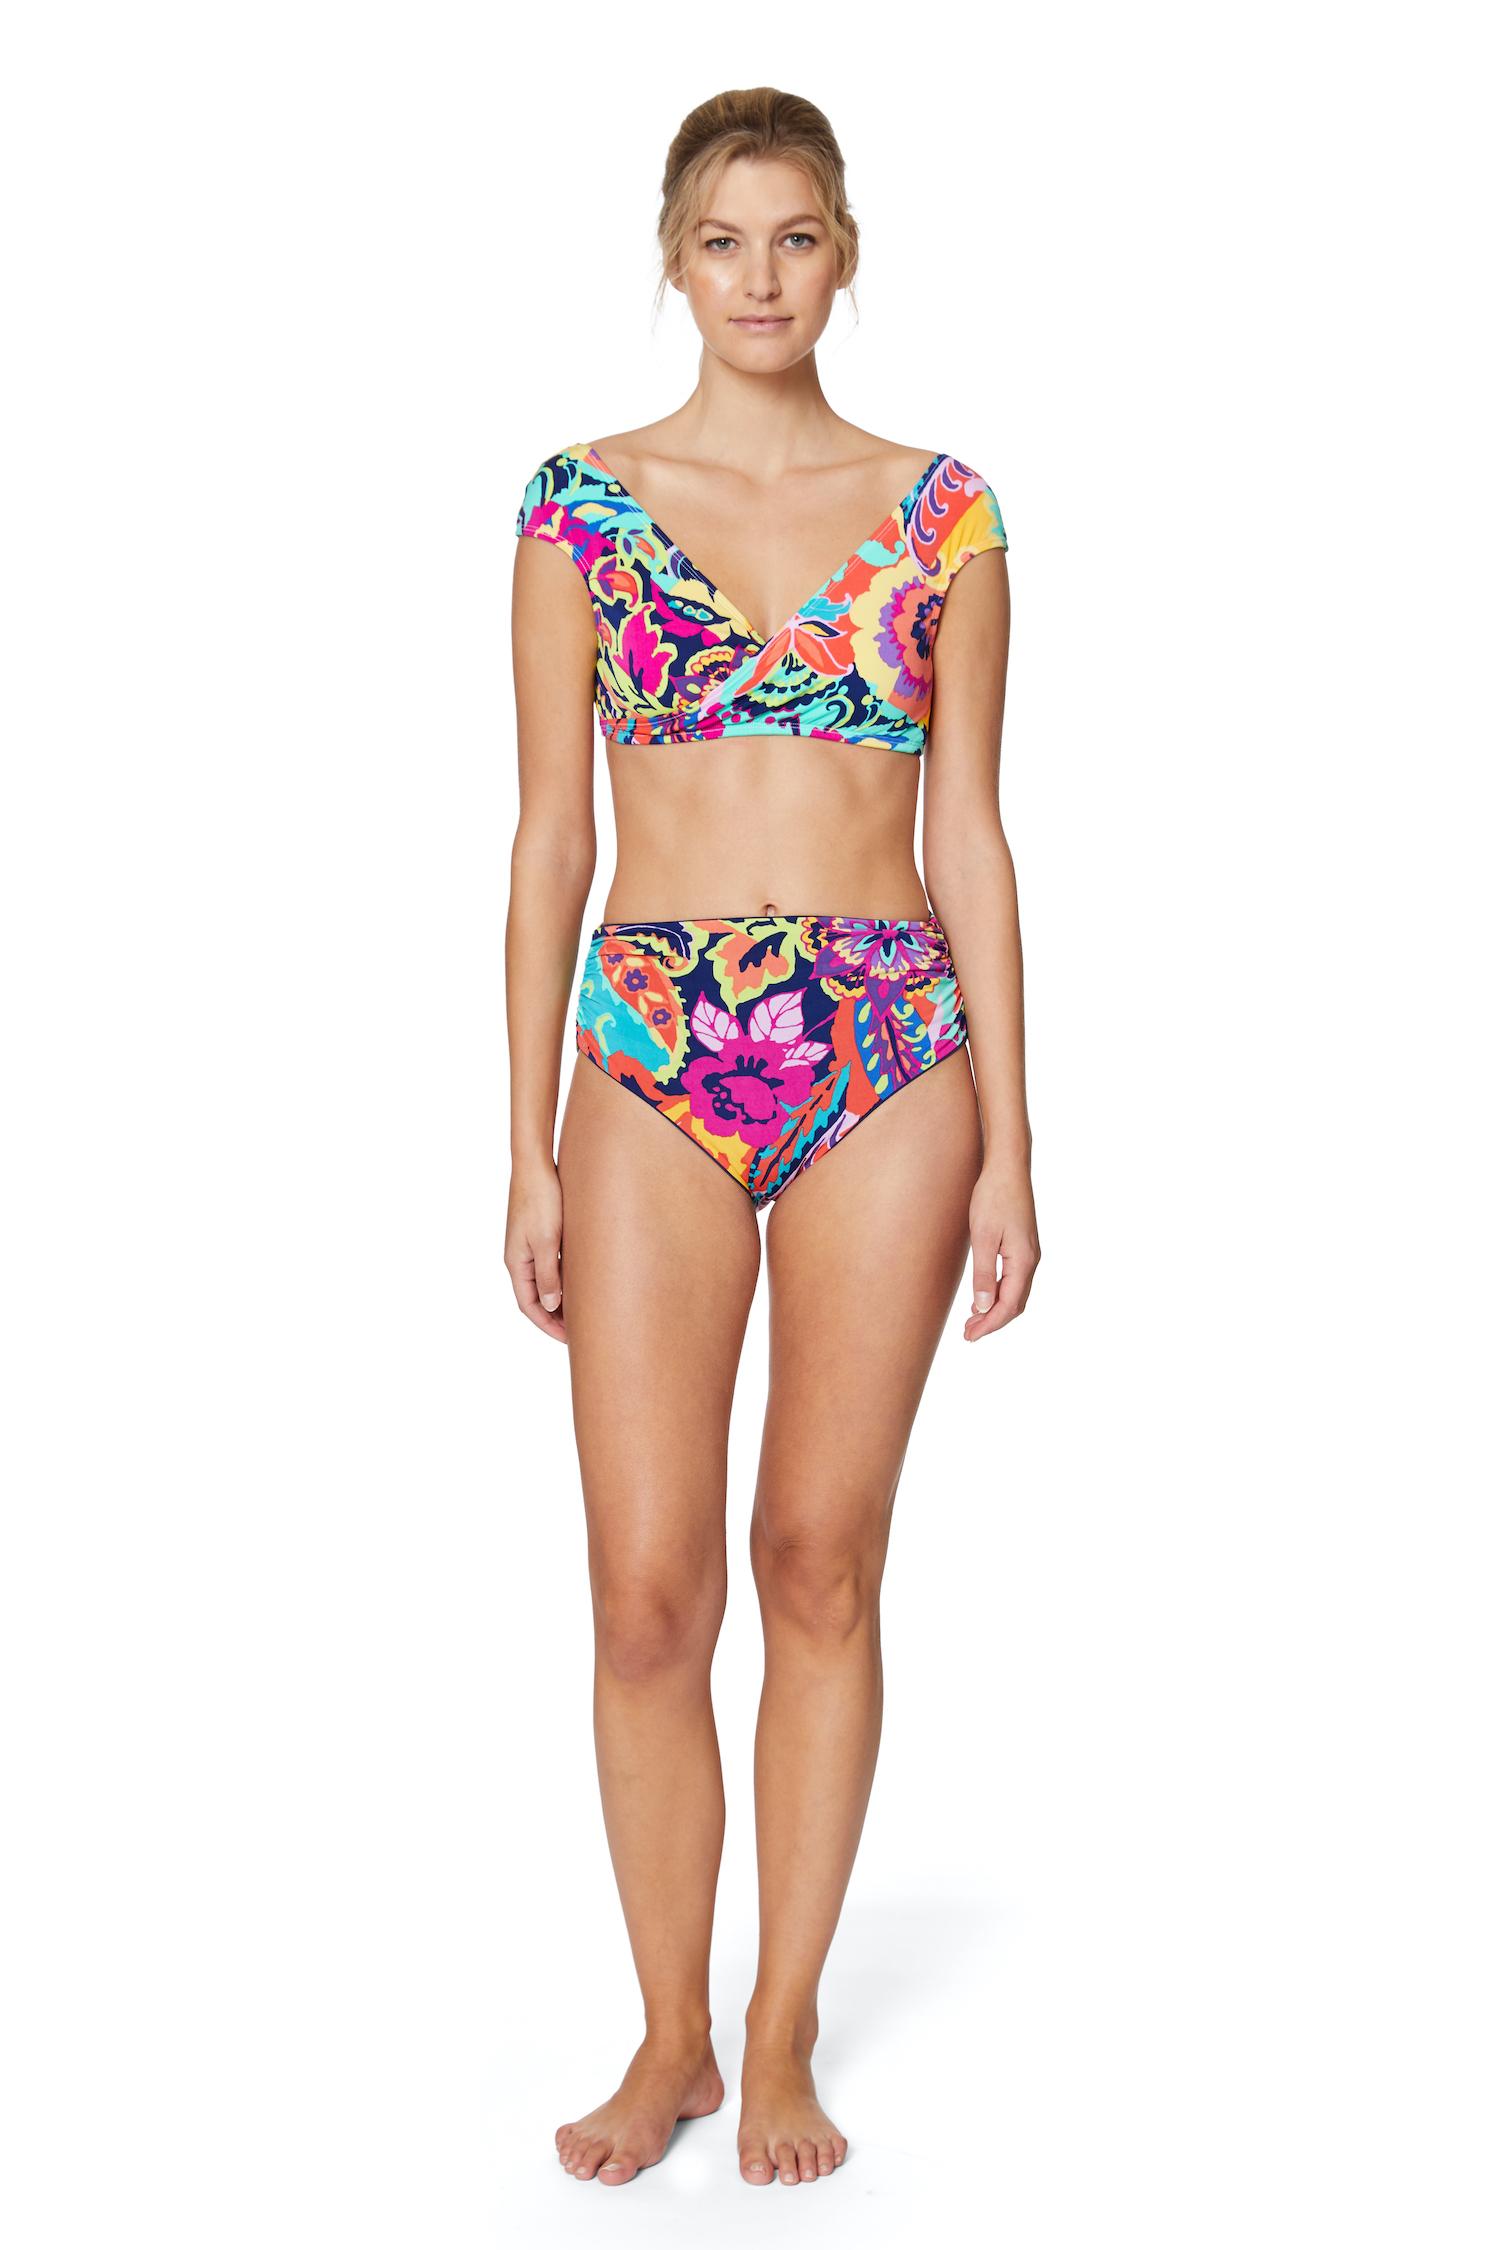 Tahari® Paris Floral Wrap Bra Swimsuit Top - Multi - Front